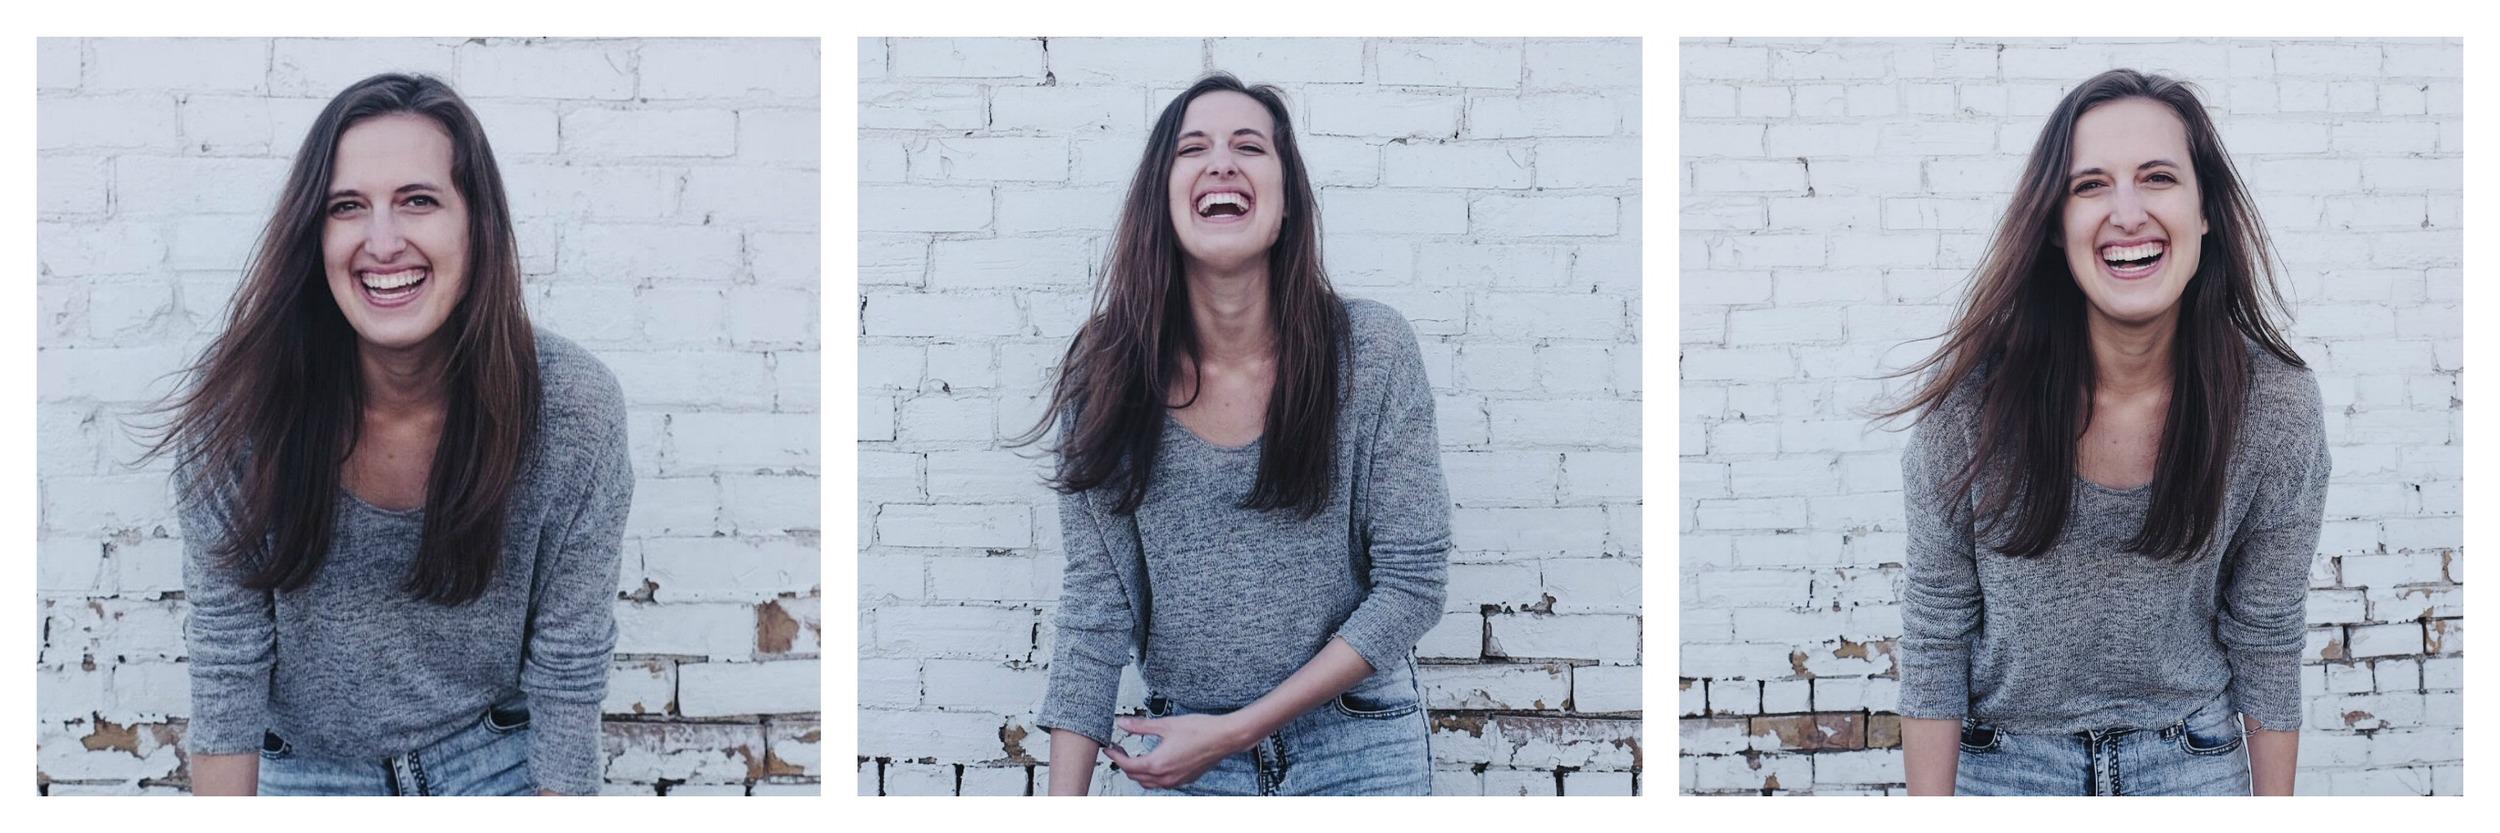 Kayla Hollatz - Founder of #createlounge: A Community for Creatives